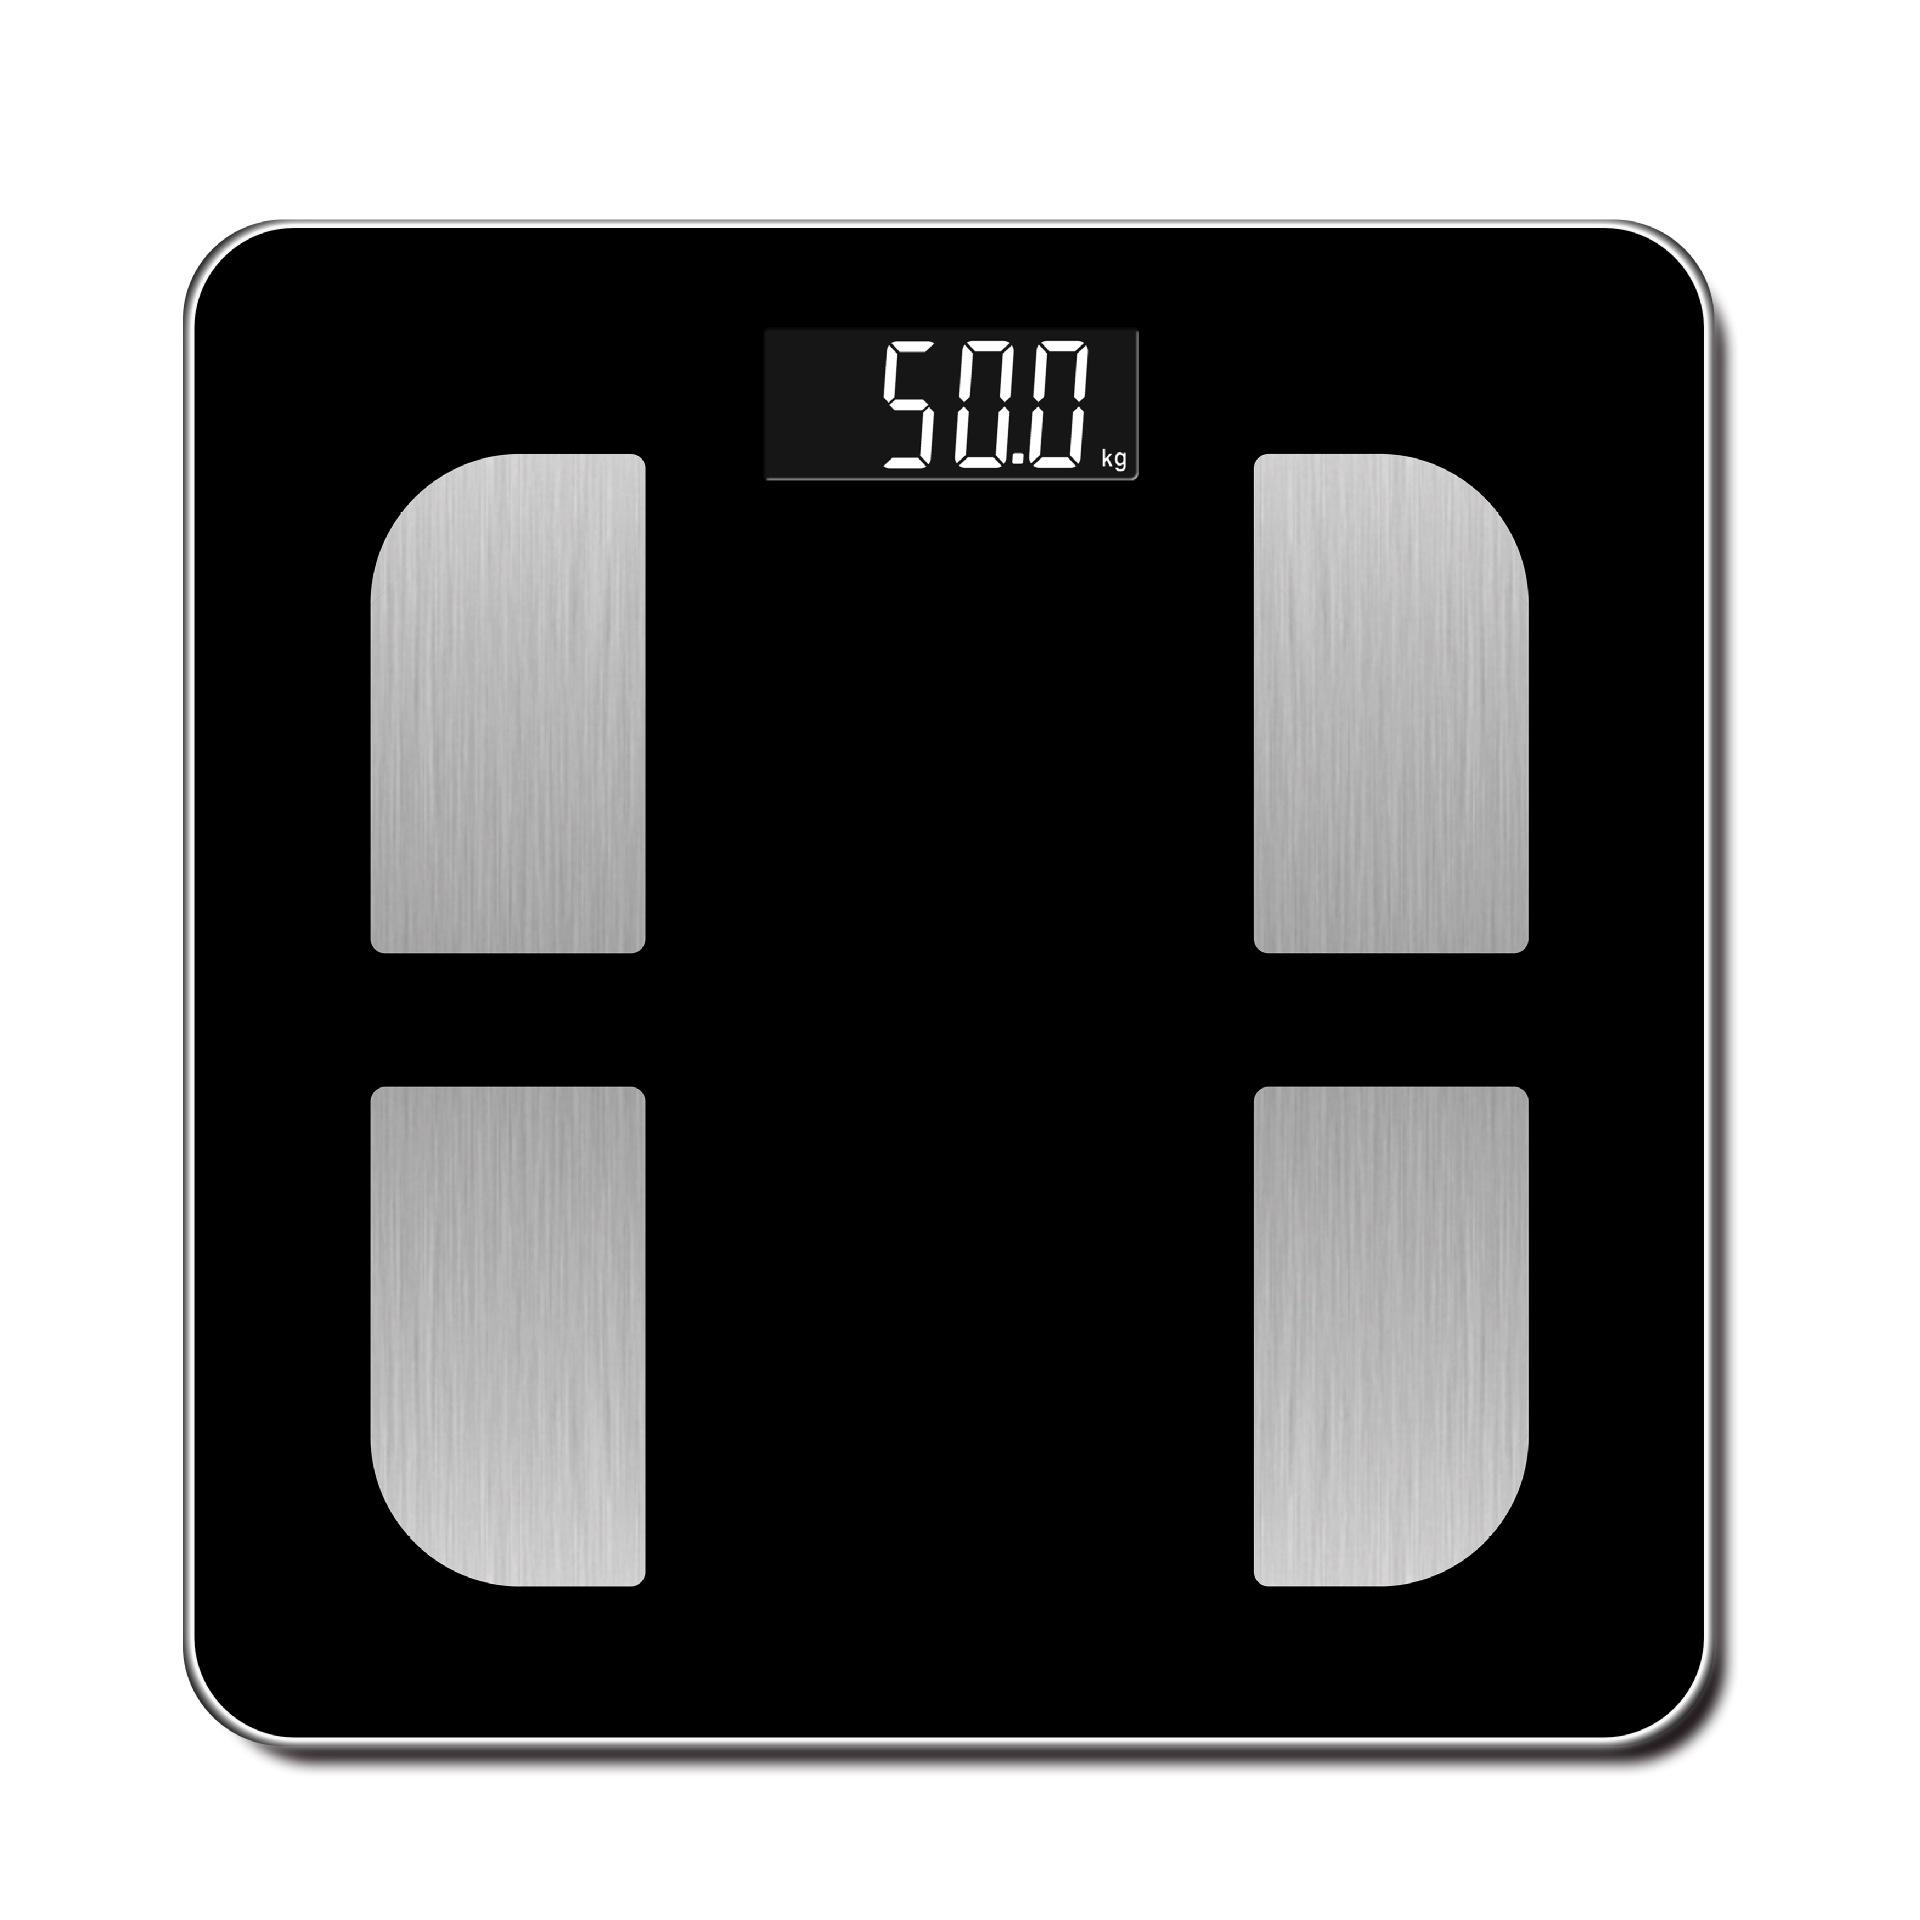 Oppel Scale Cân vảy Bluetooth của con người